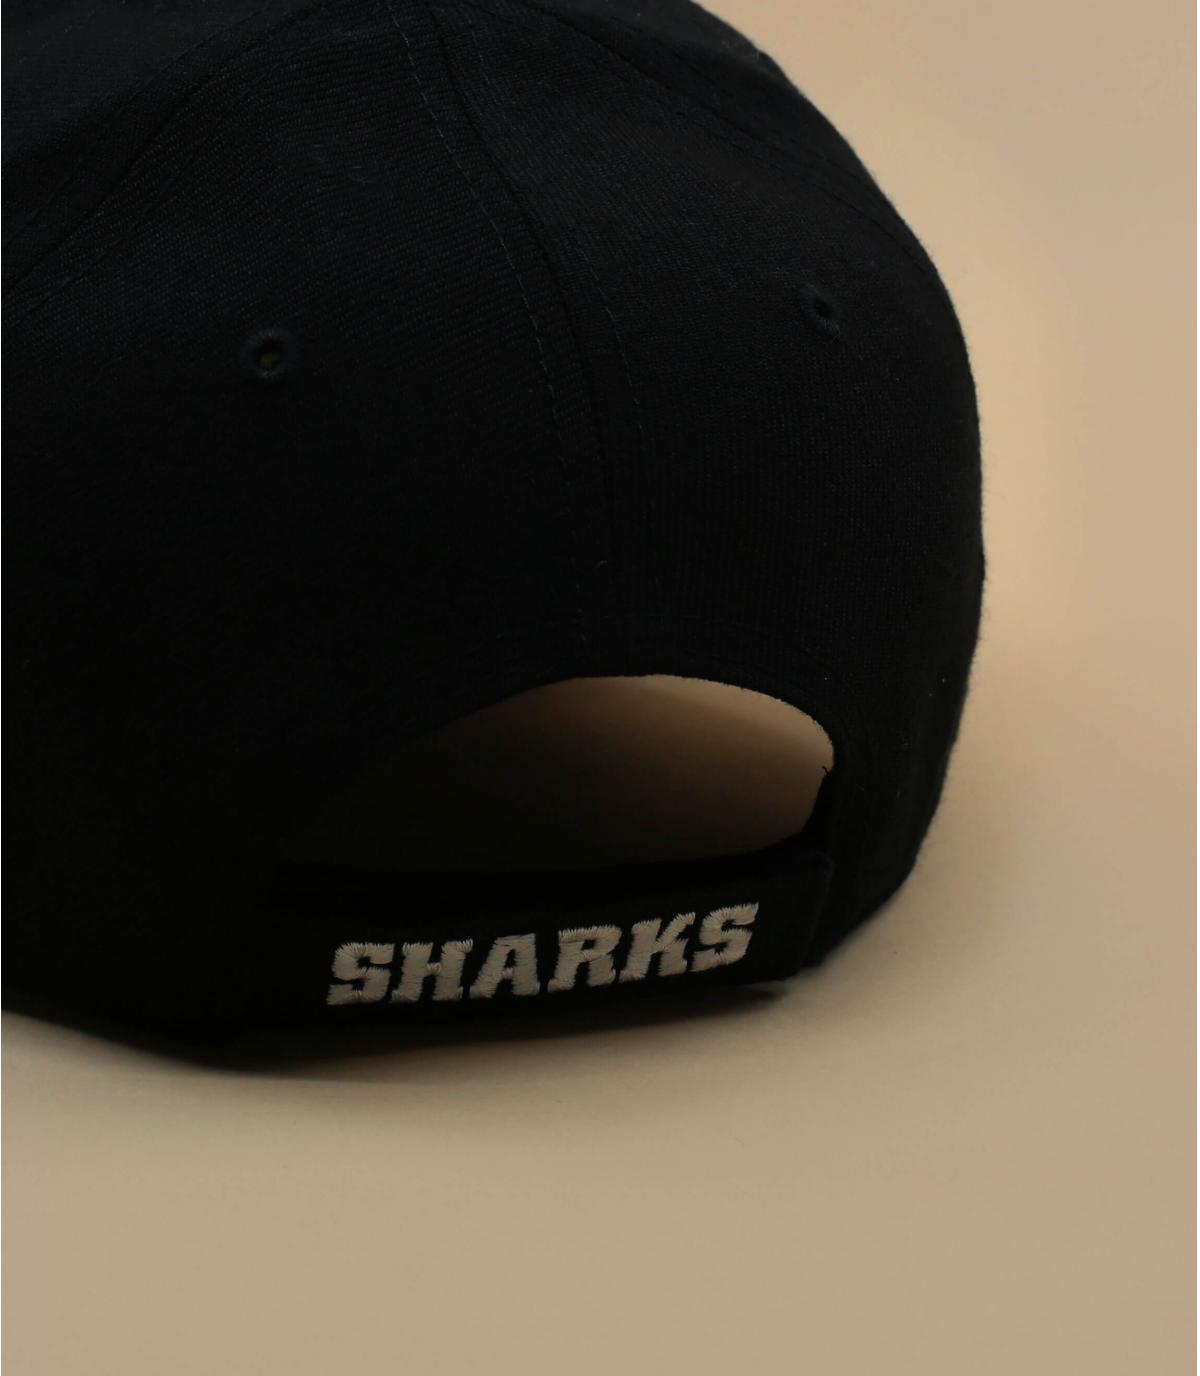 Détails MVP San Jose Sharks black - image 5